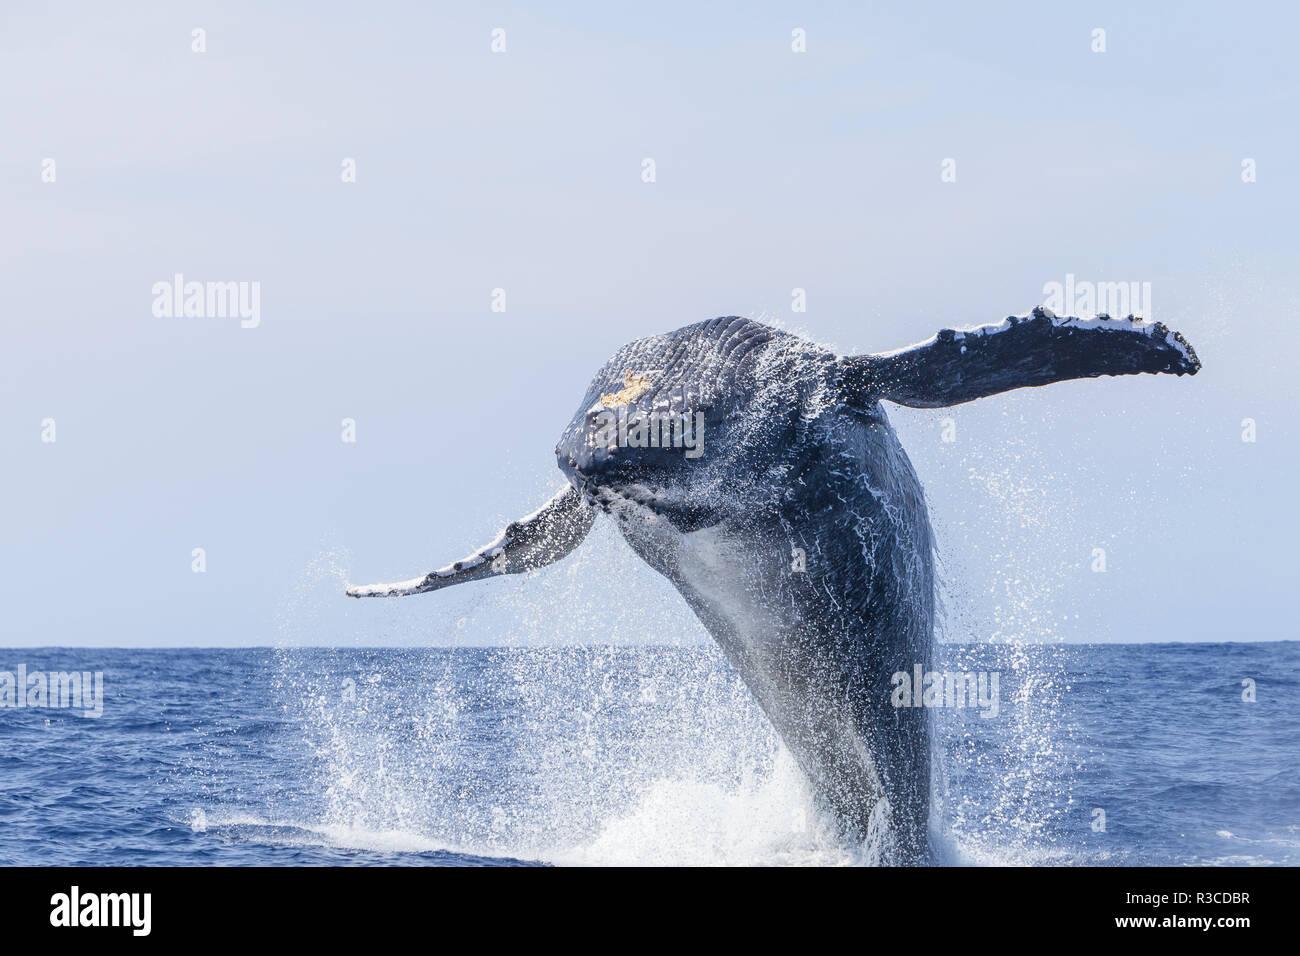 Las ballenas jorobadas (Megaptera novaeangliae), cerca de Kona, Big Island, Hawai Foto de stock